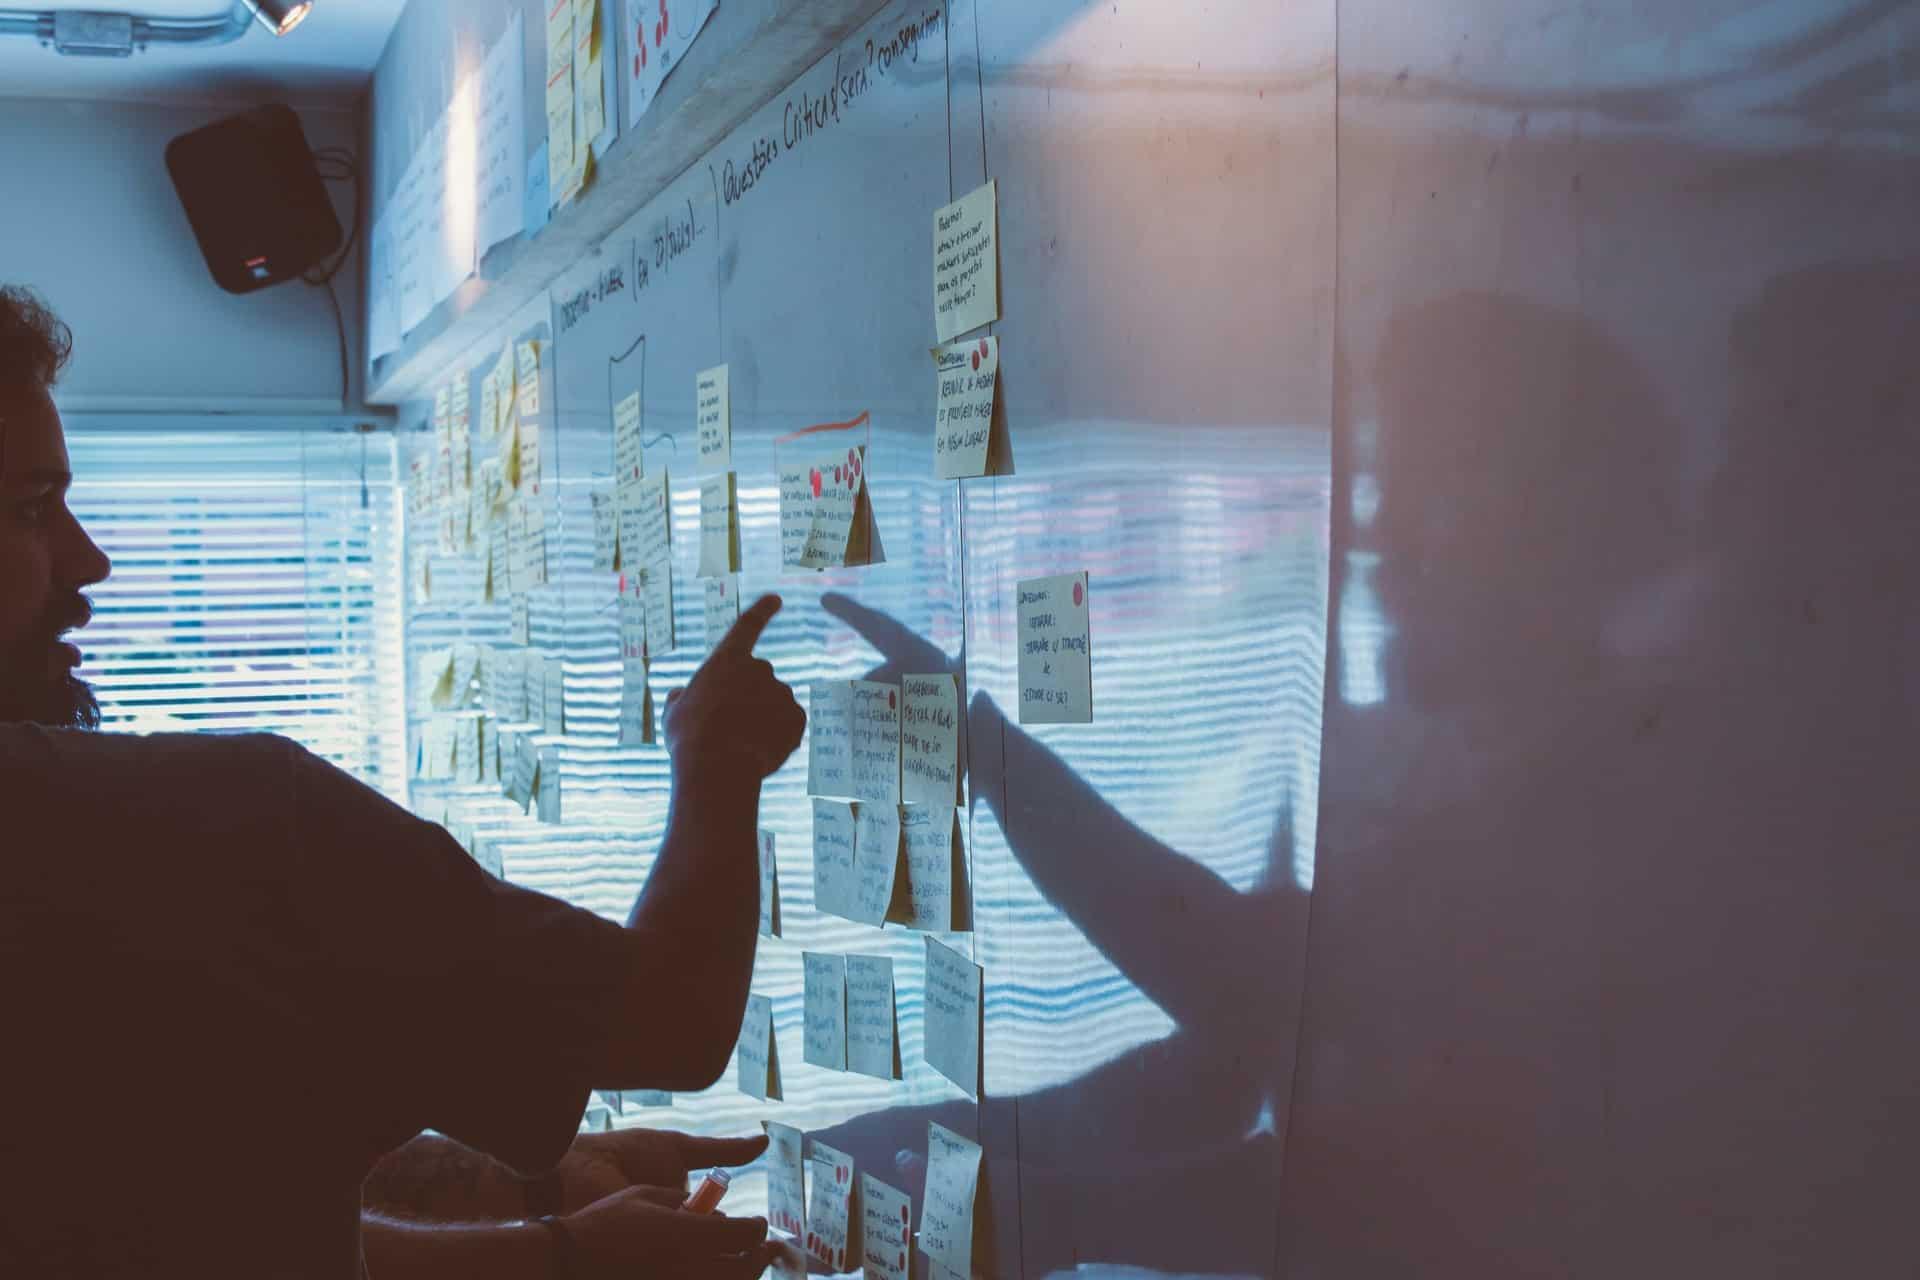 Startups no país registram número recorde de investimentos por adquirentes